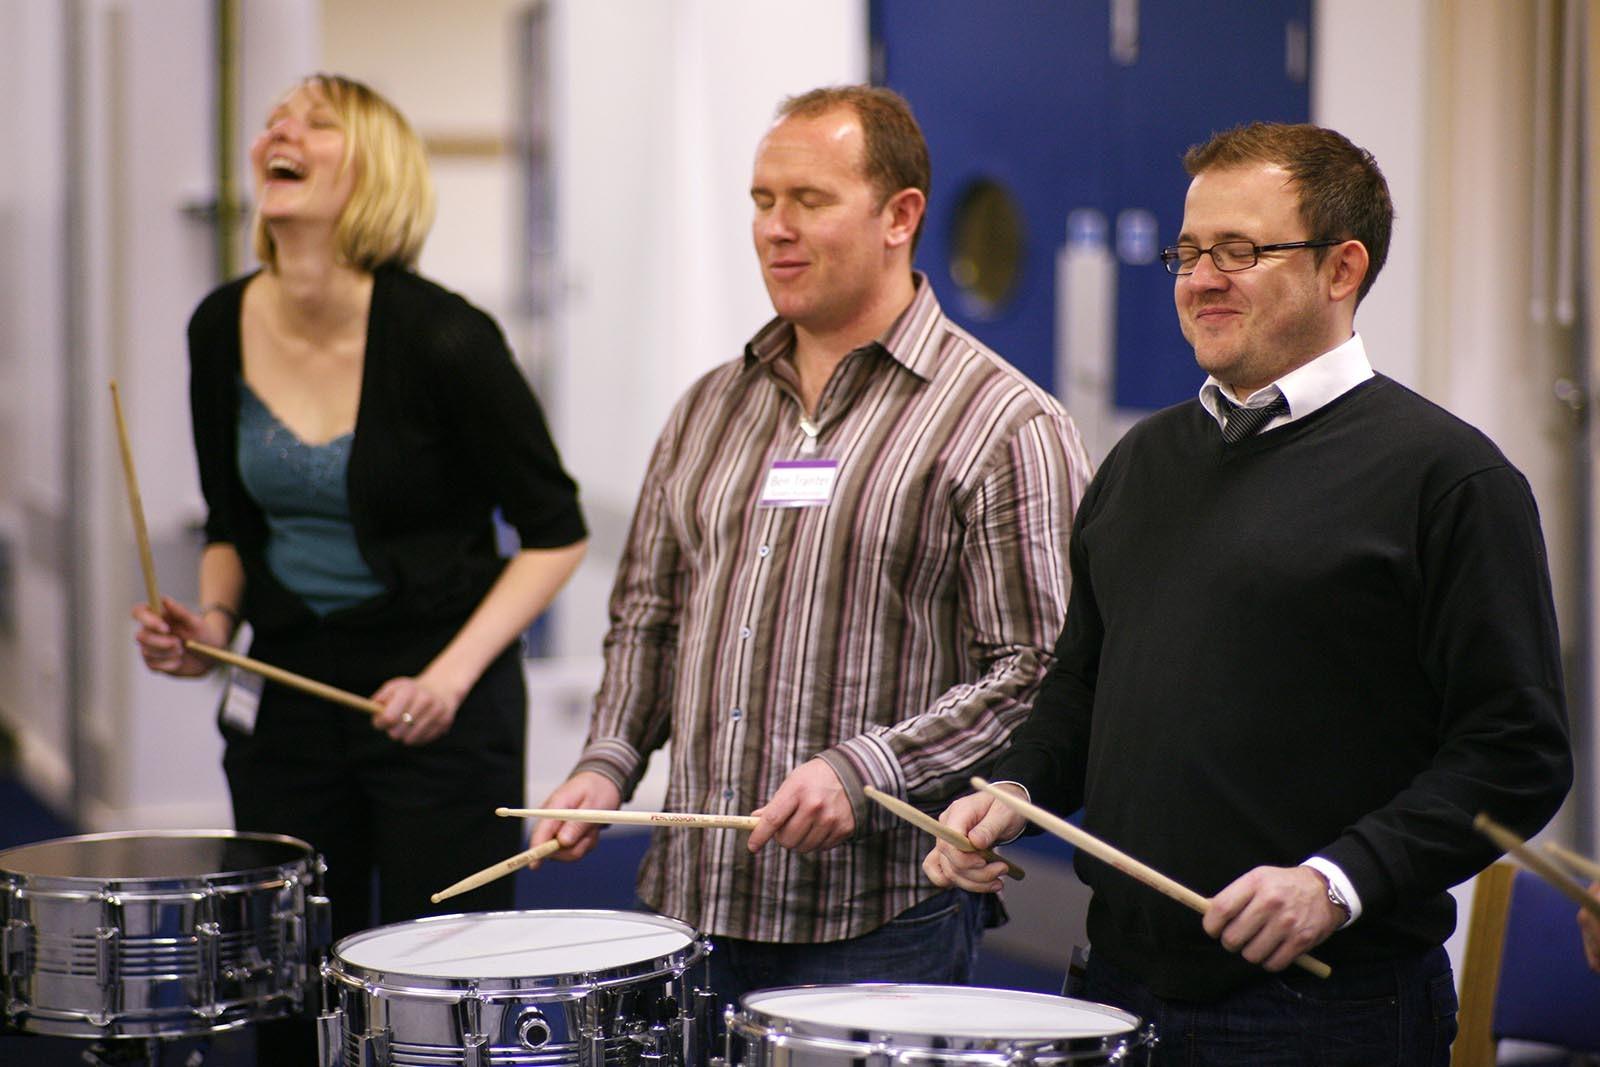 Panove se snazi soustredit na stejny rytmus pri aktivite Orchestrate